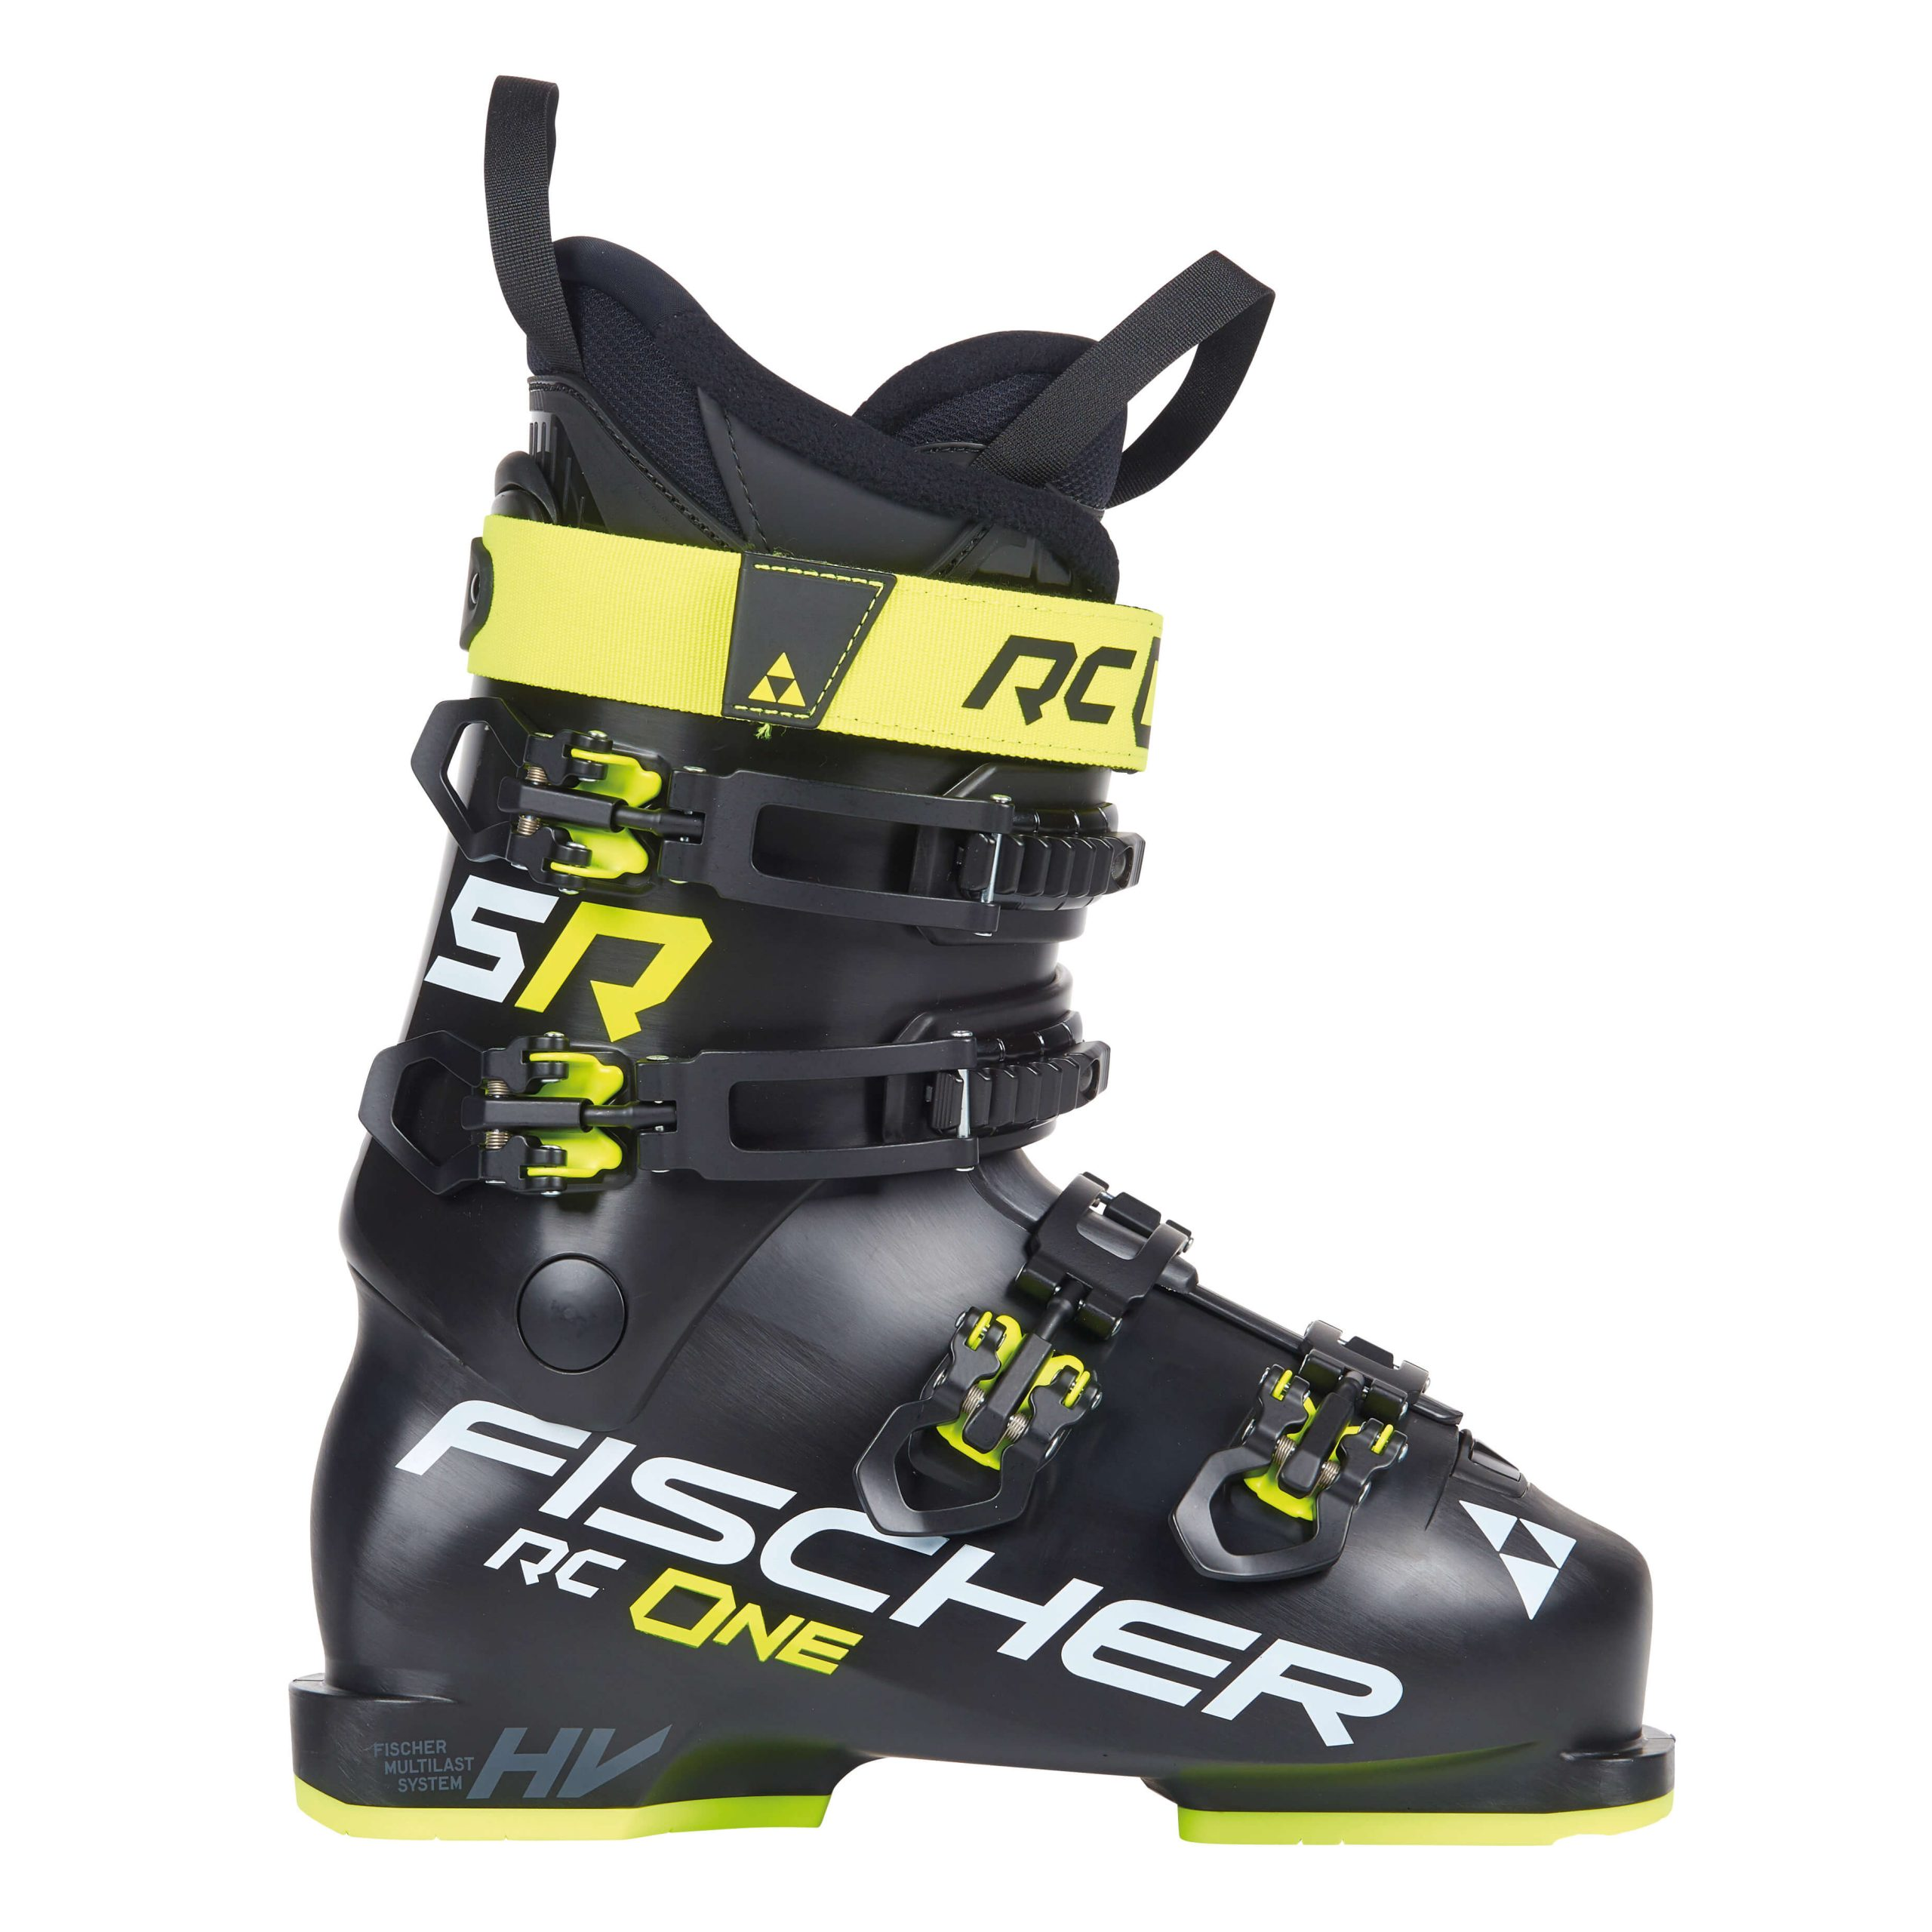 buty narciarskie fischer rc one sport black 2021